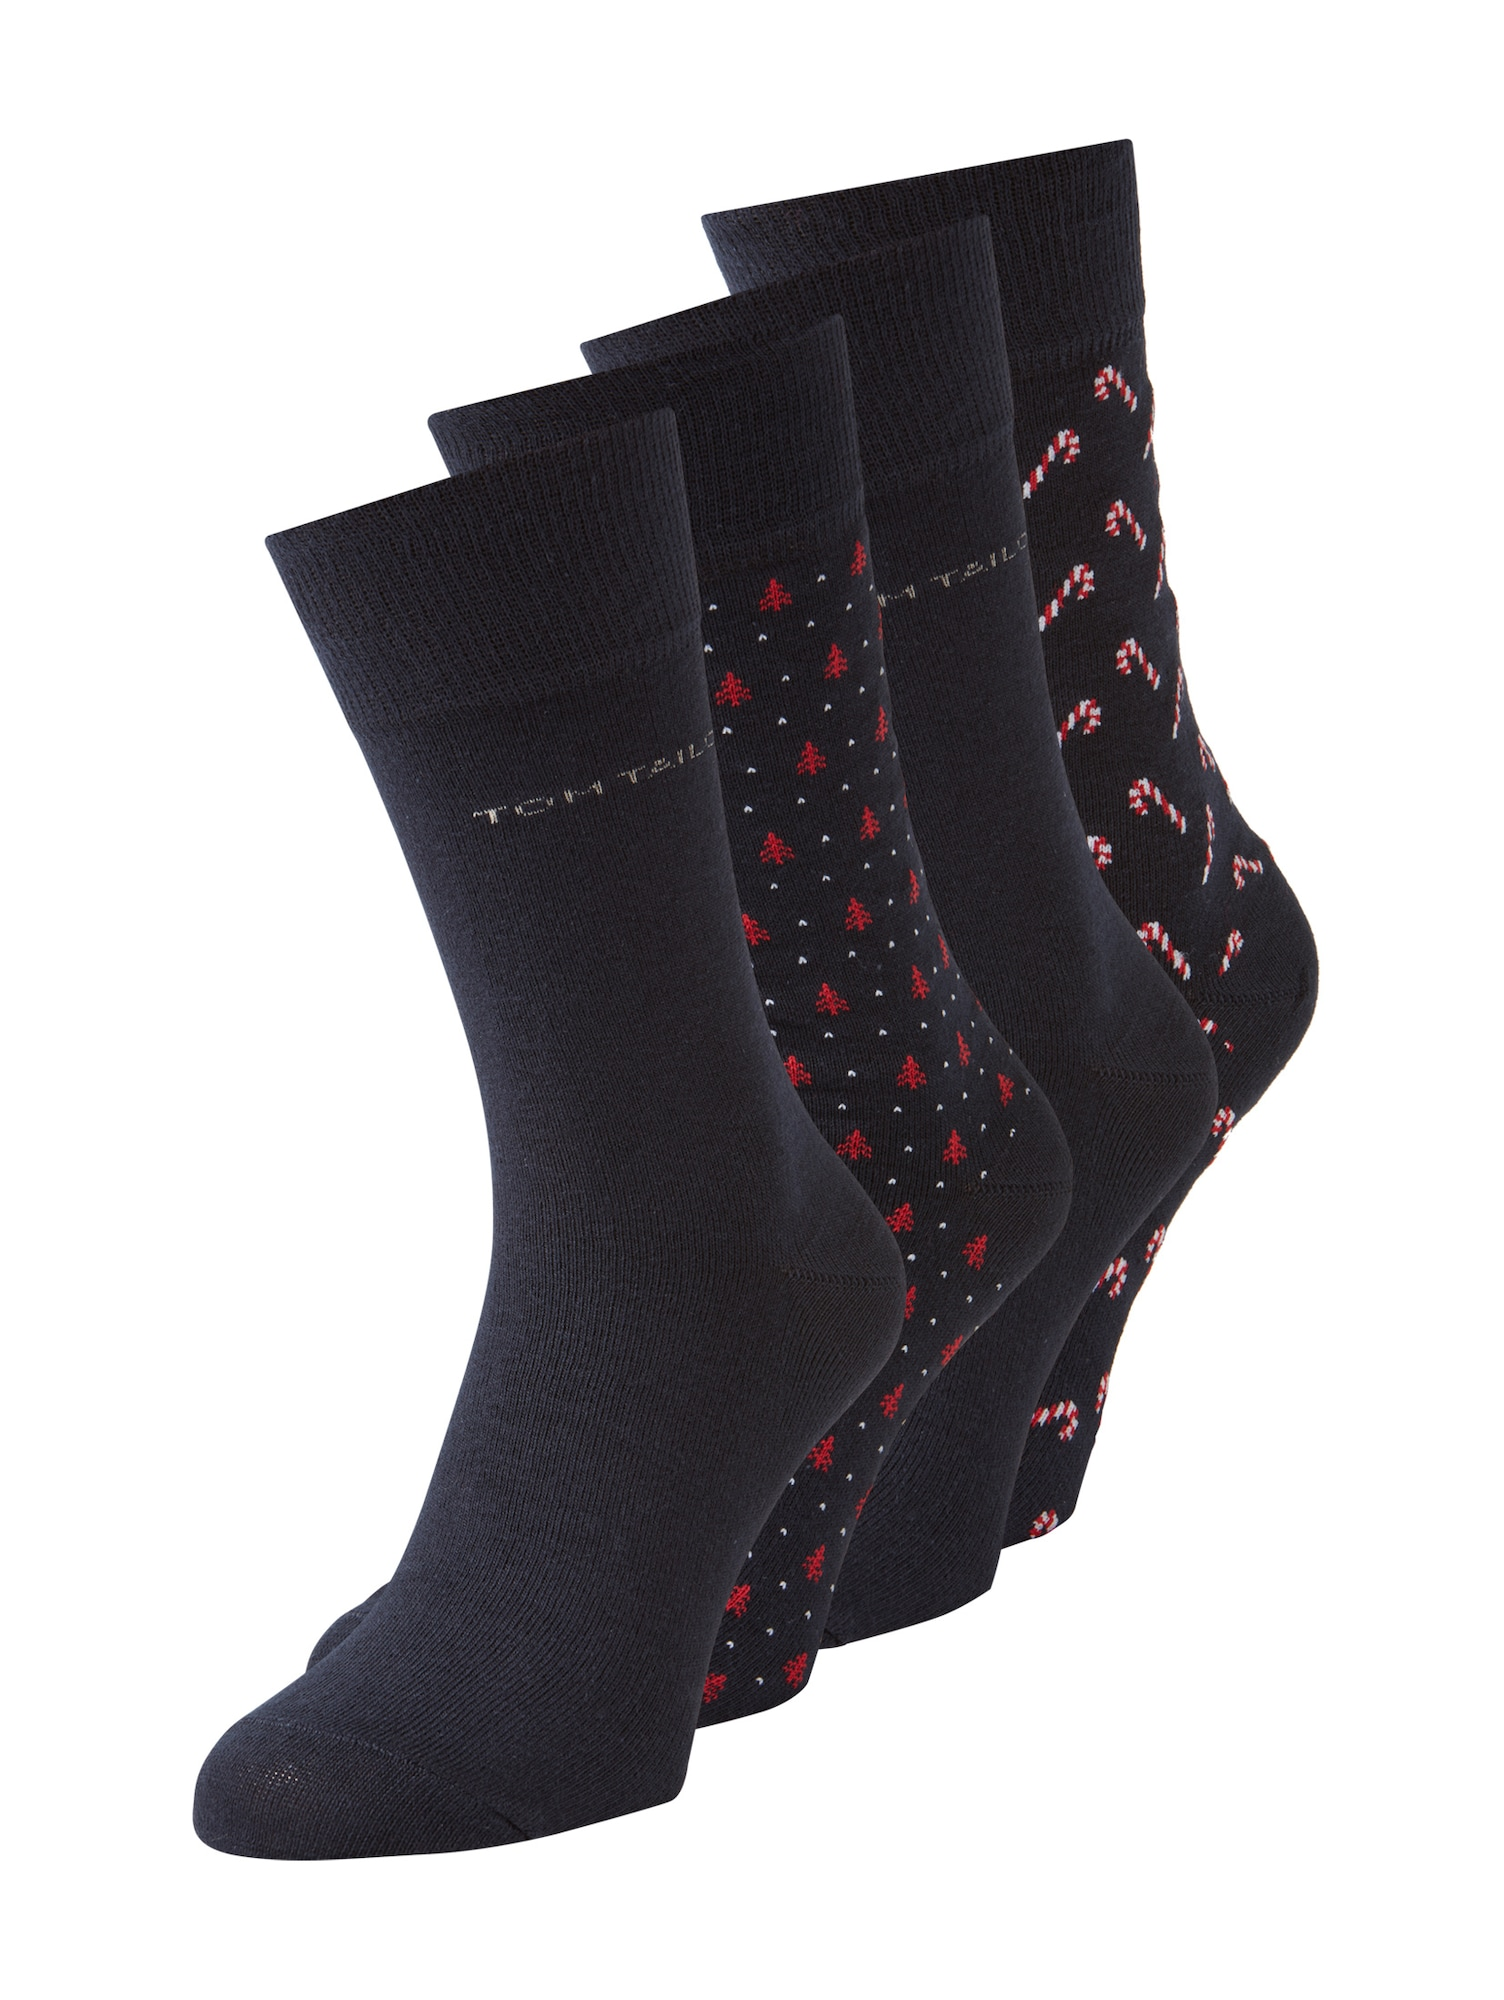 Socken 'X-Mas' | Bekleidung > Wäsche > Socken | TOM TAILOR